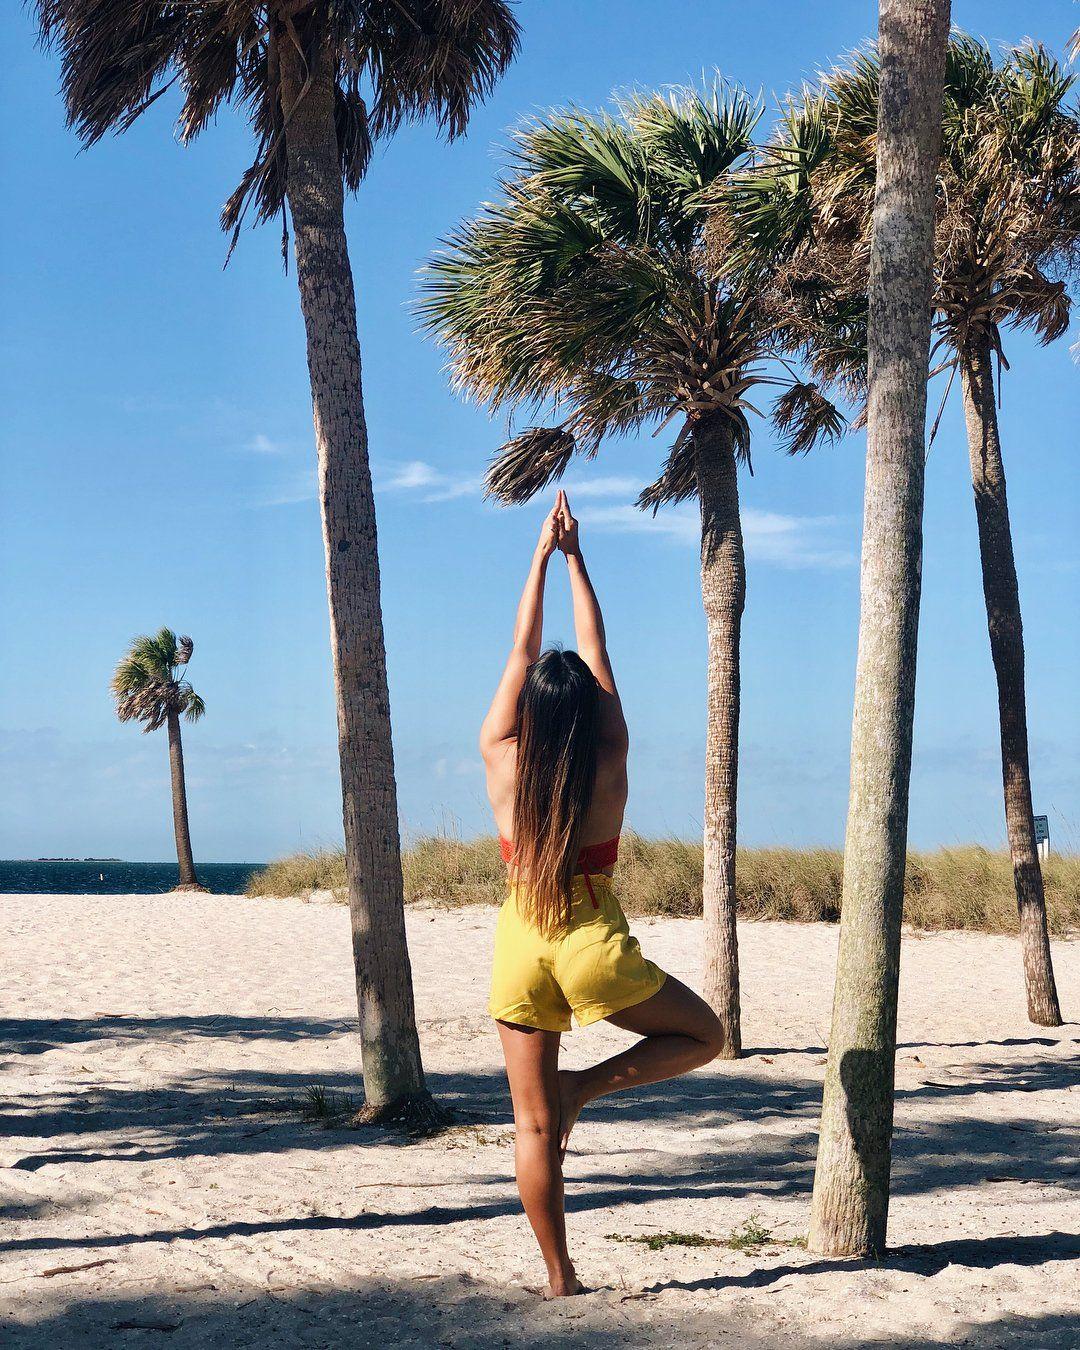 Beaches Visit St Petersburg Clearwater Florida